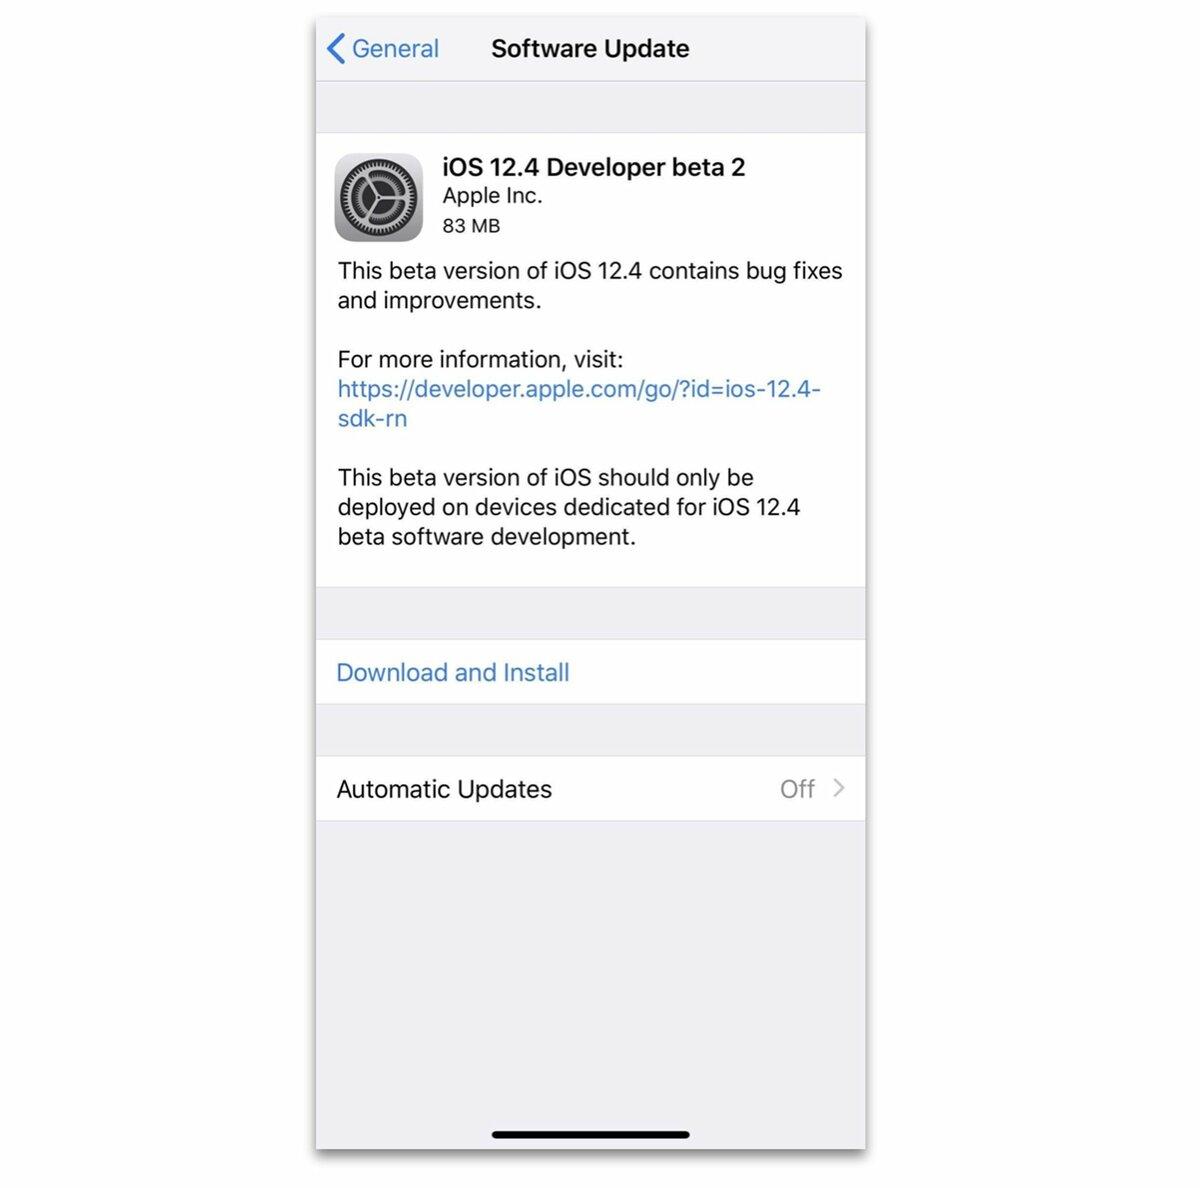 Loading iOS_12_4_developer_beta_2_tinhte.jpg ...